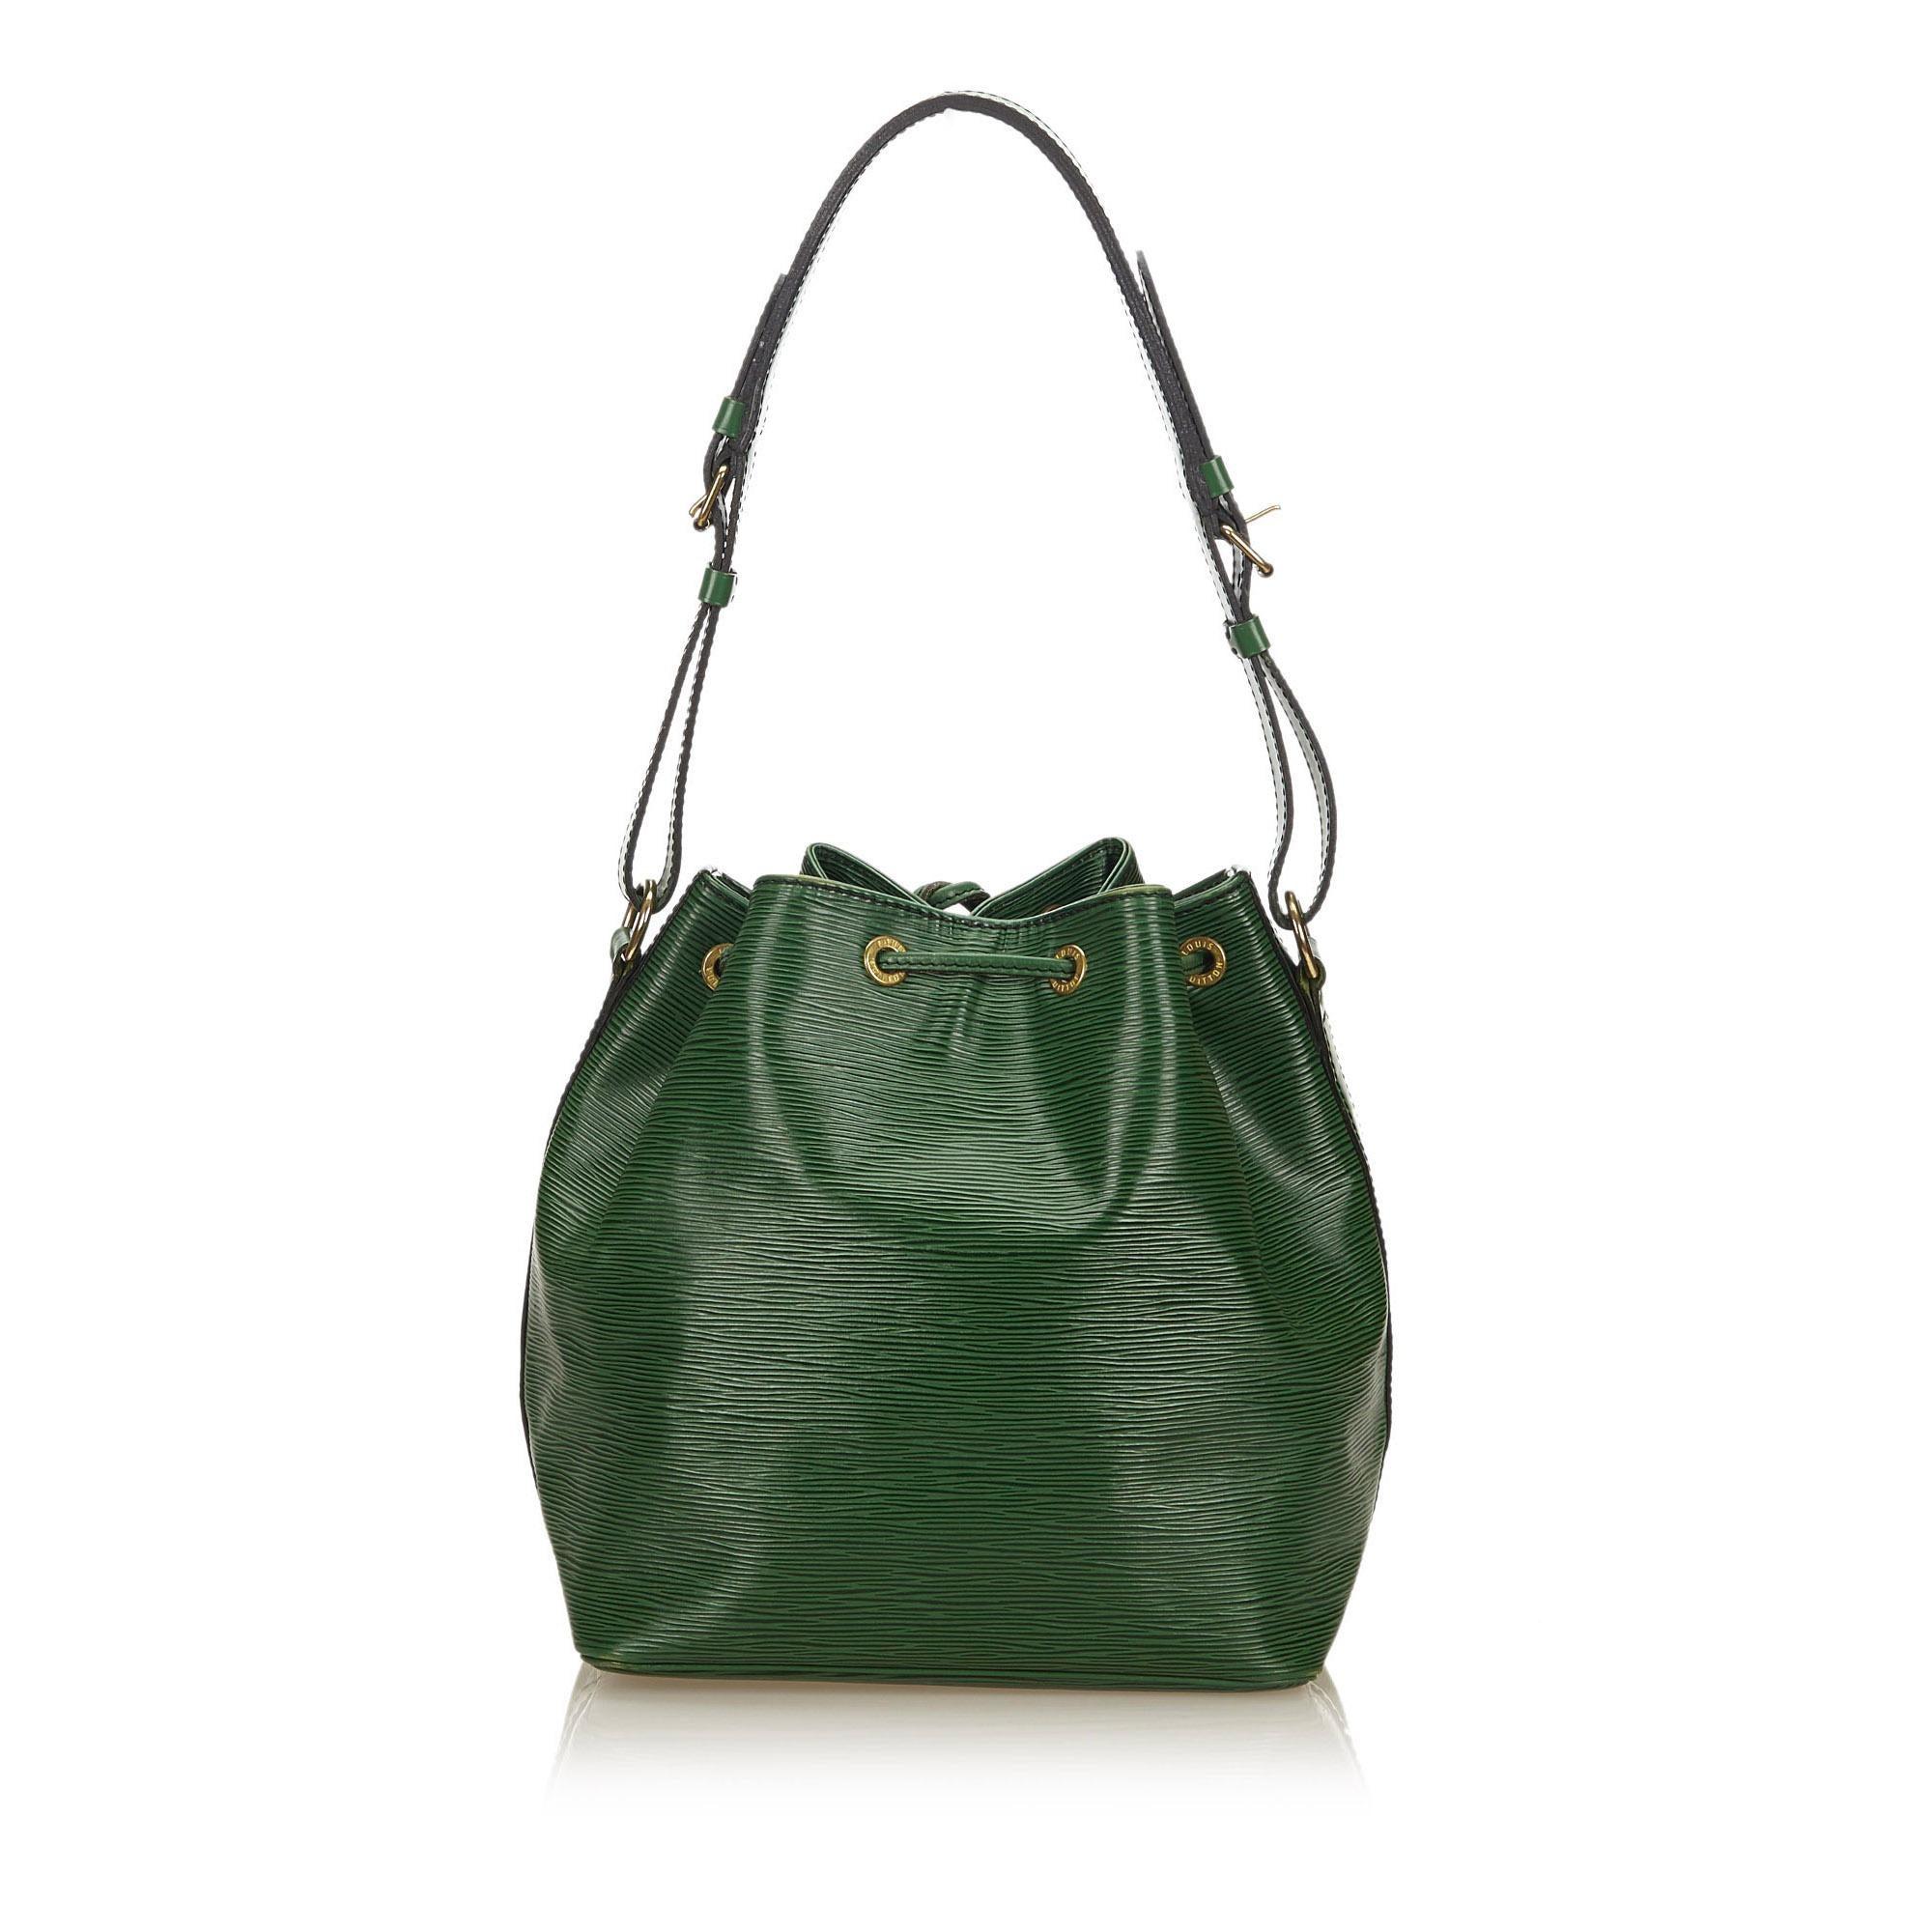 3693e01f9eb76 Louis Vuitton grün Epi Petit Noe bei 1stdibs